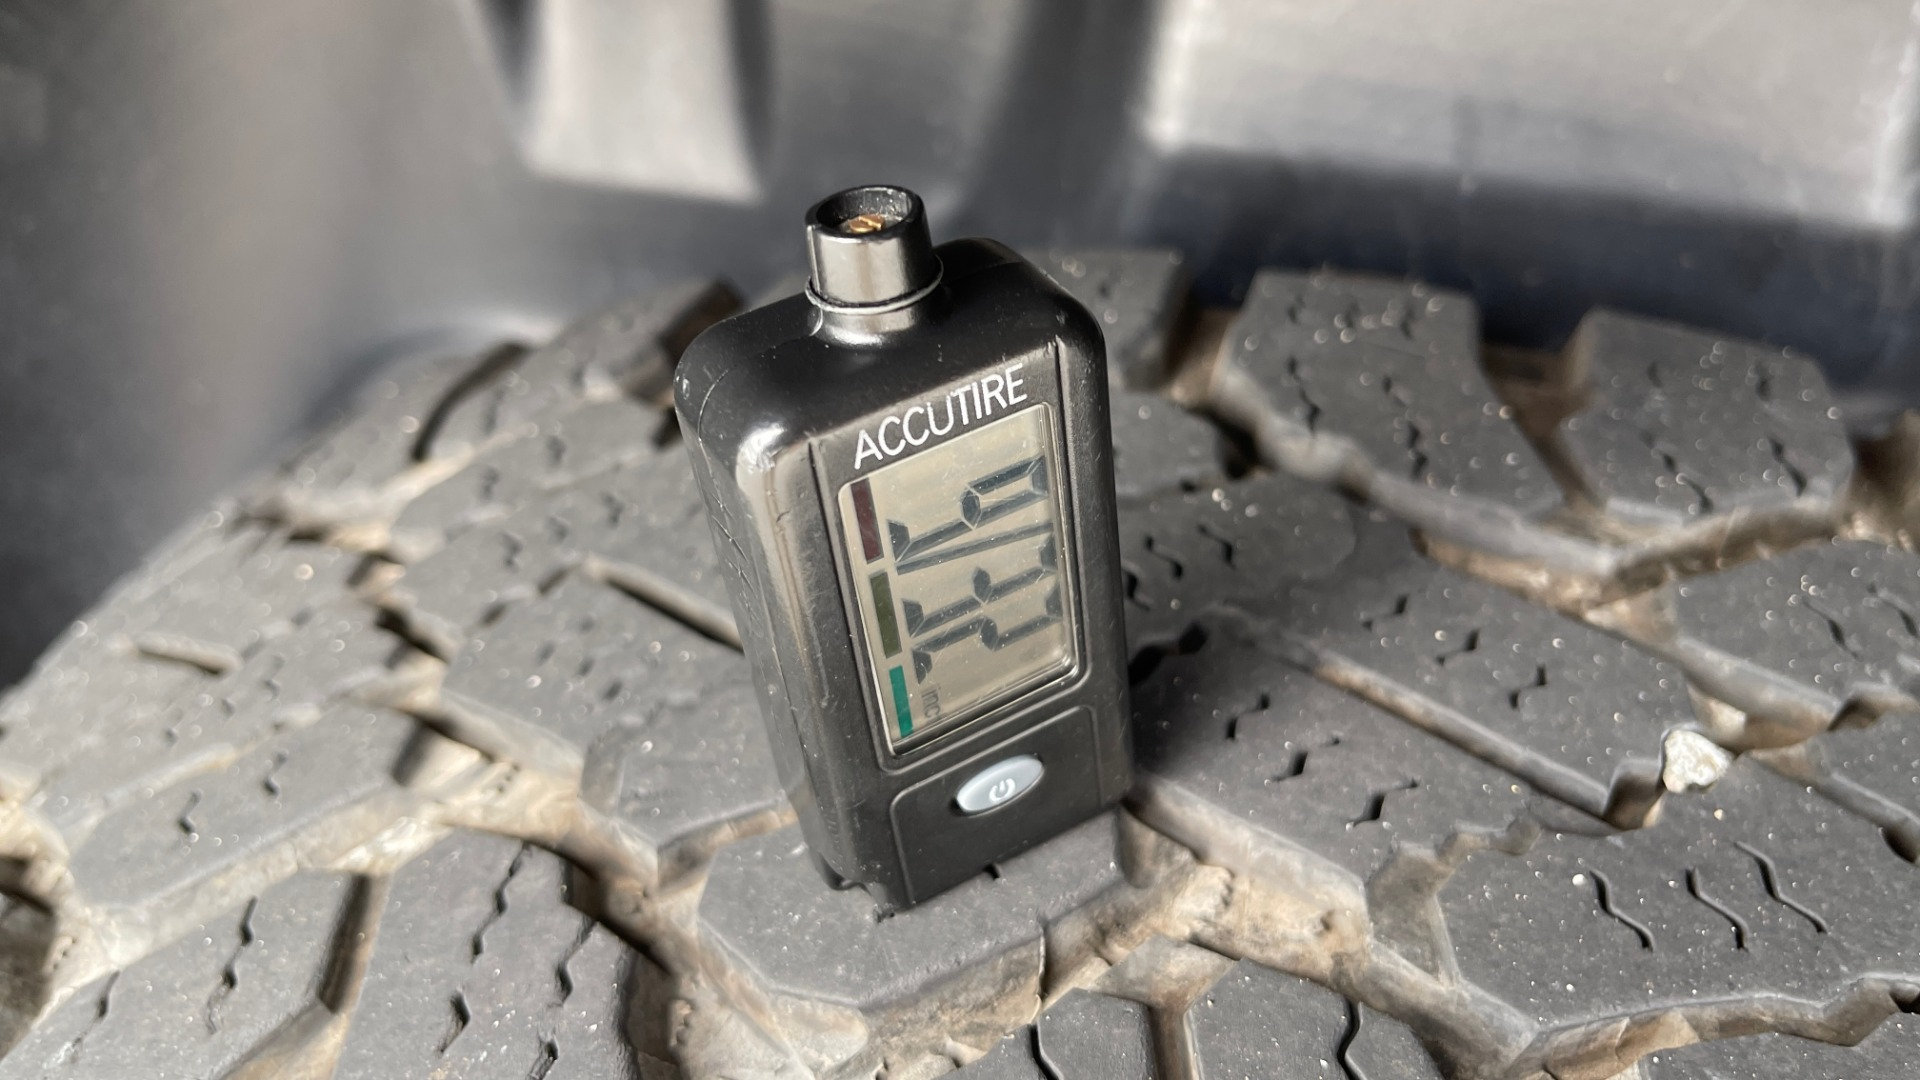 Used 2019 Ram 1500 REBEL QUADCAB 4X4 / 5.7L HEMI / 8-SPD AUTO / REMOTE START / PARK ASSIST for sale $44,495 at Formula Imports in Charlotte NC 28227 75